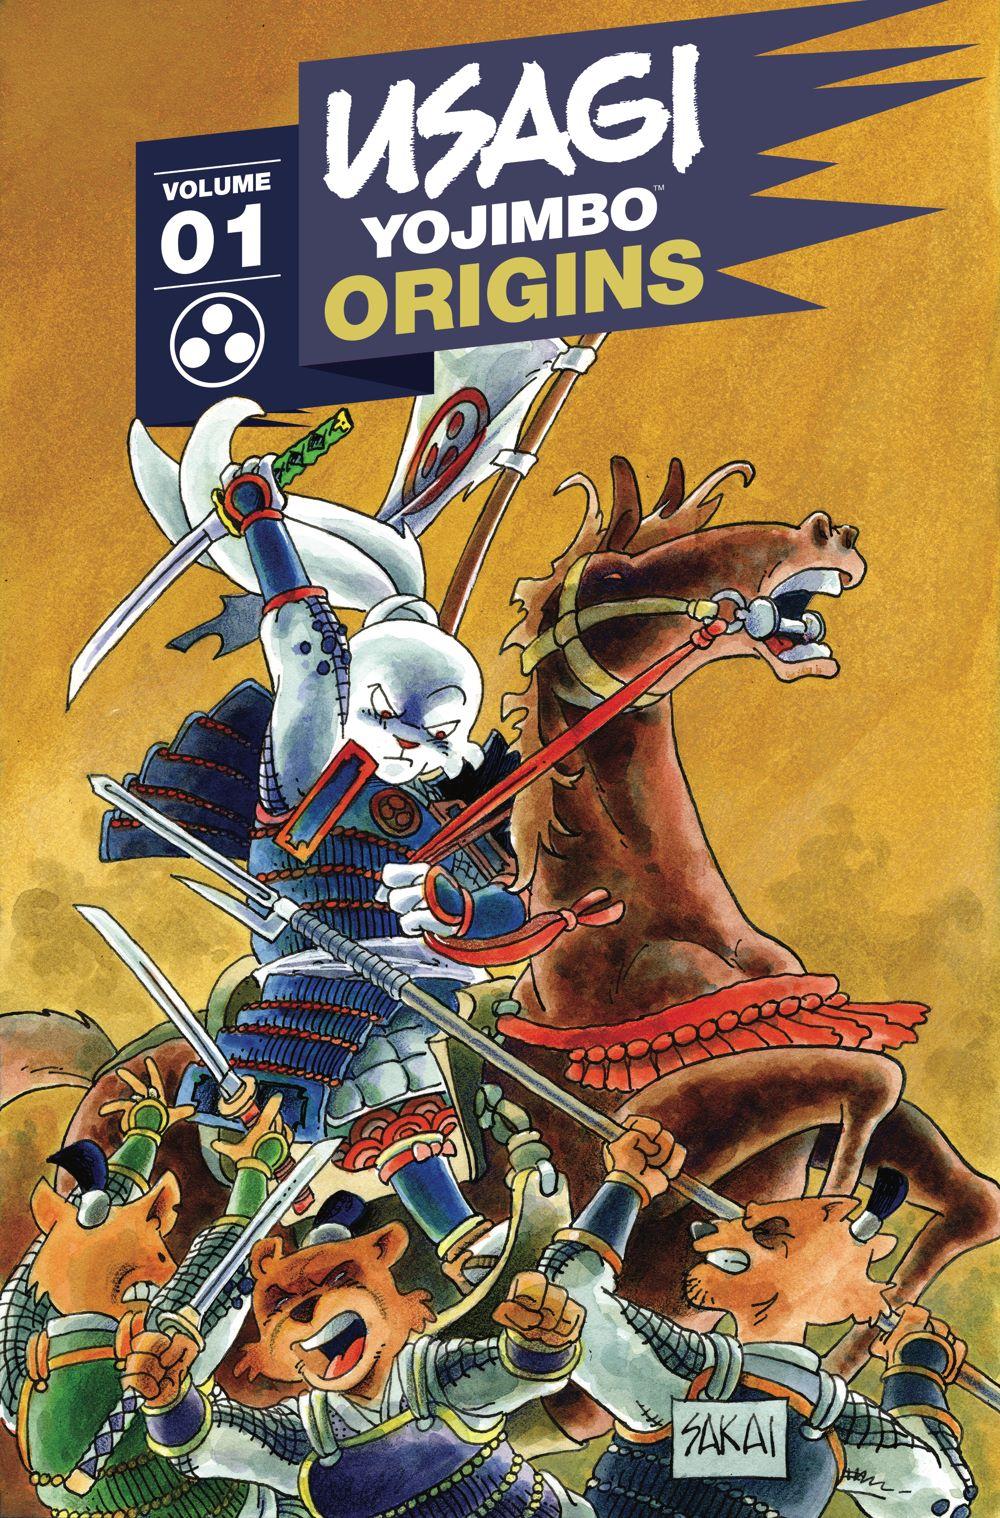 Usagi-Origins-v01_cvr ComicList Previews: USAGI YOJIMBO ORIGINS VOLUME 1 SAMURAI TP